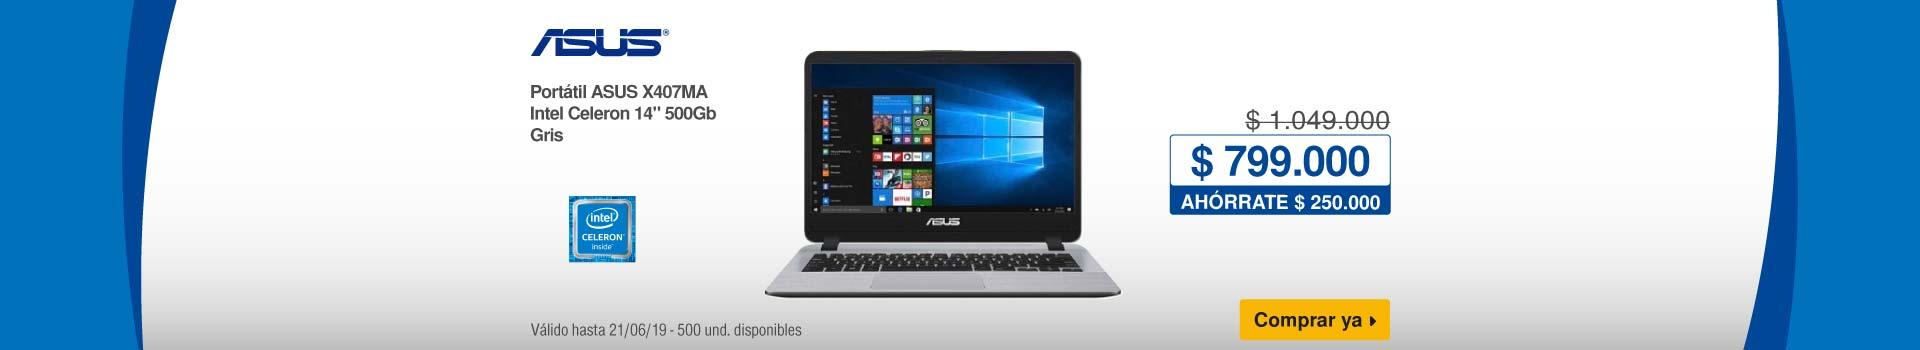 AK-KT--Asus-Port-X407MA-GrCAT-5-computadoresytablets16_junio